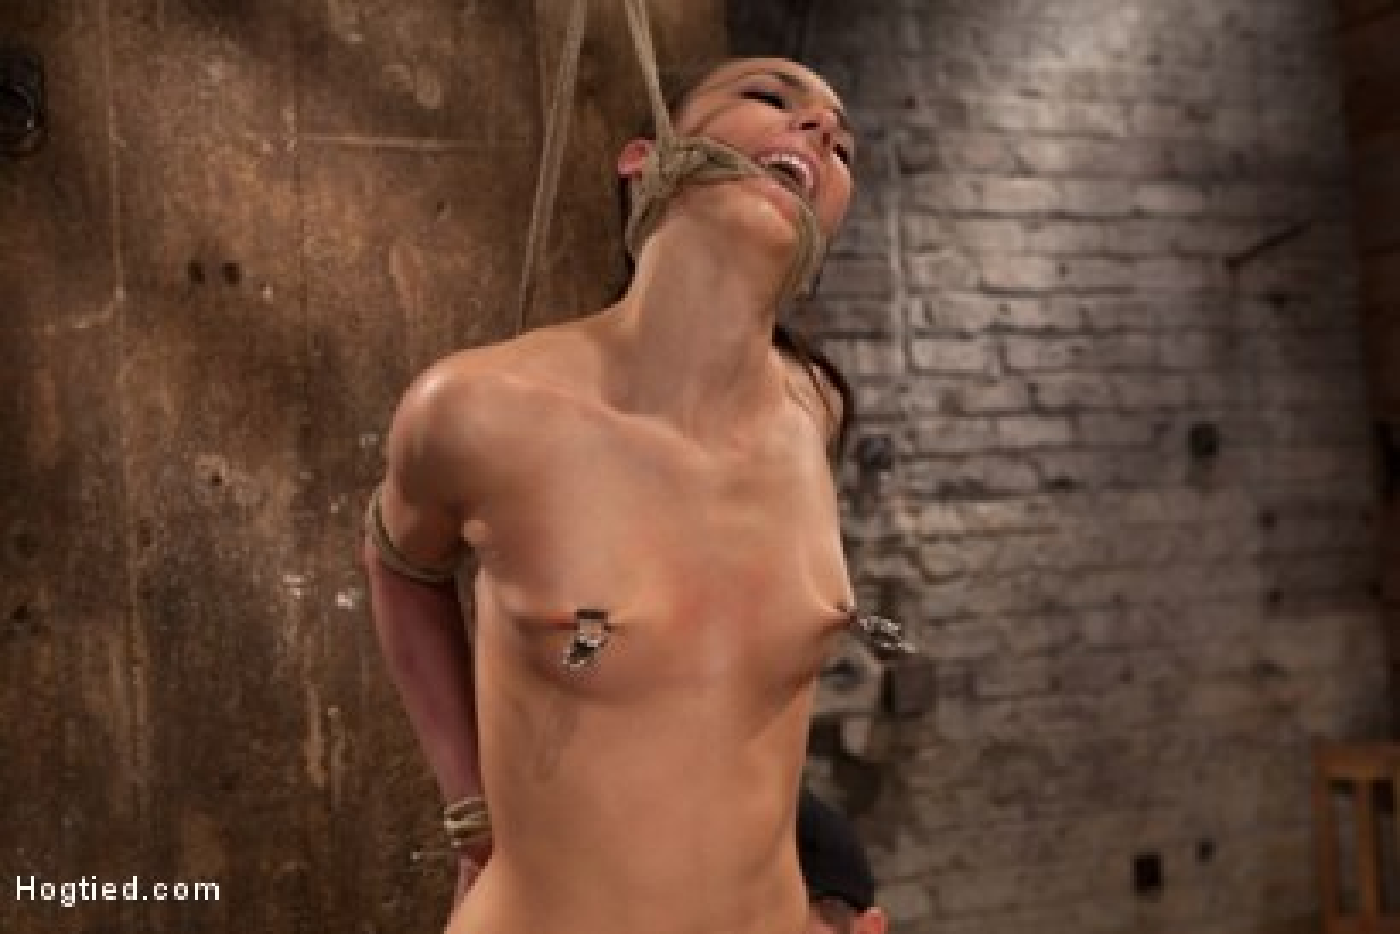 neck dungeon Roped equipment bondage